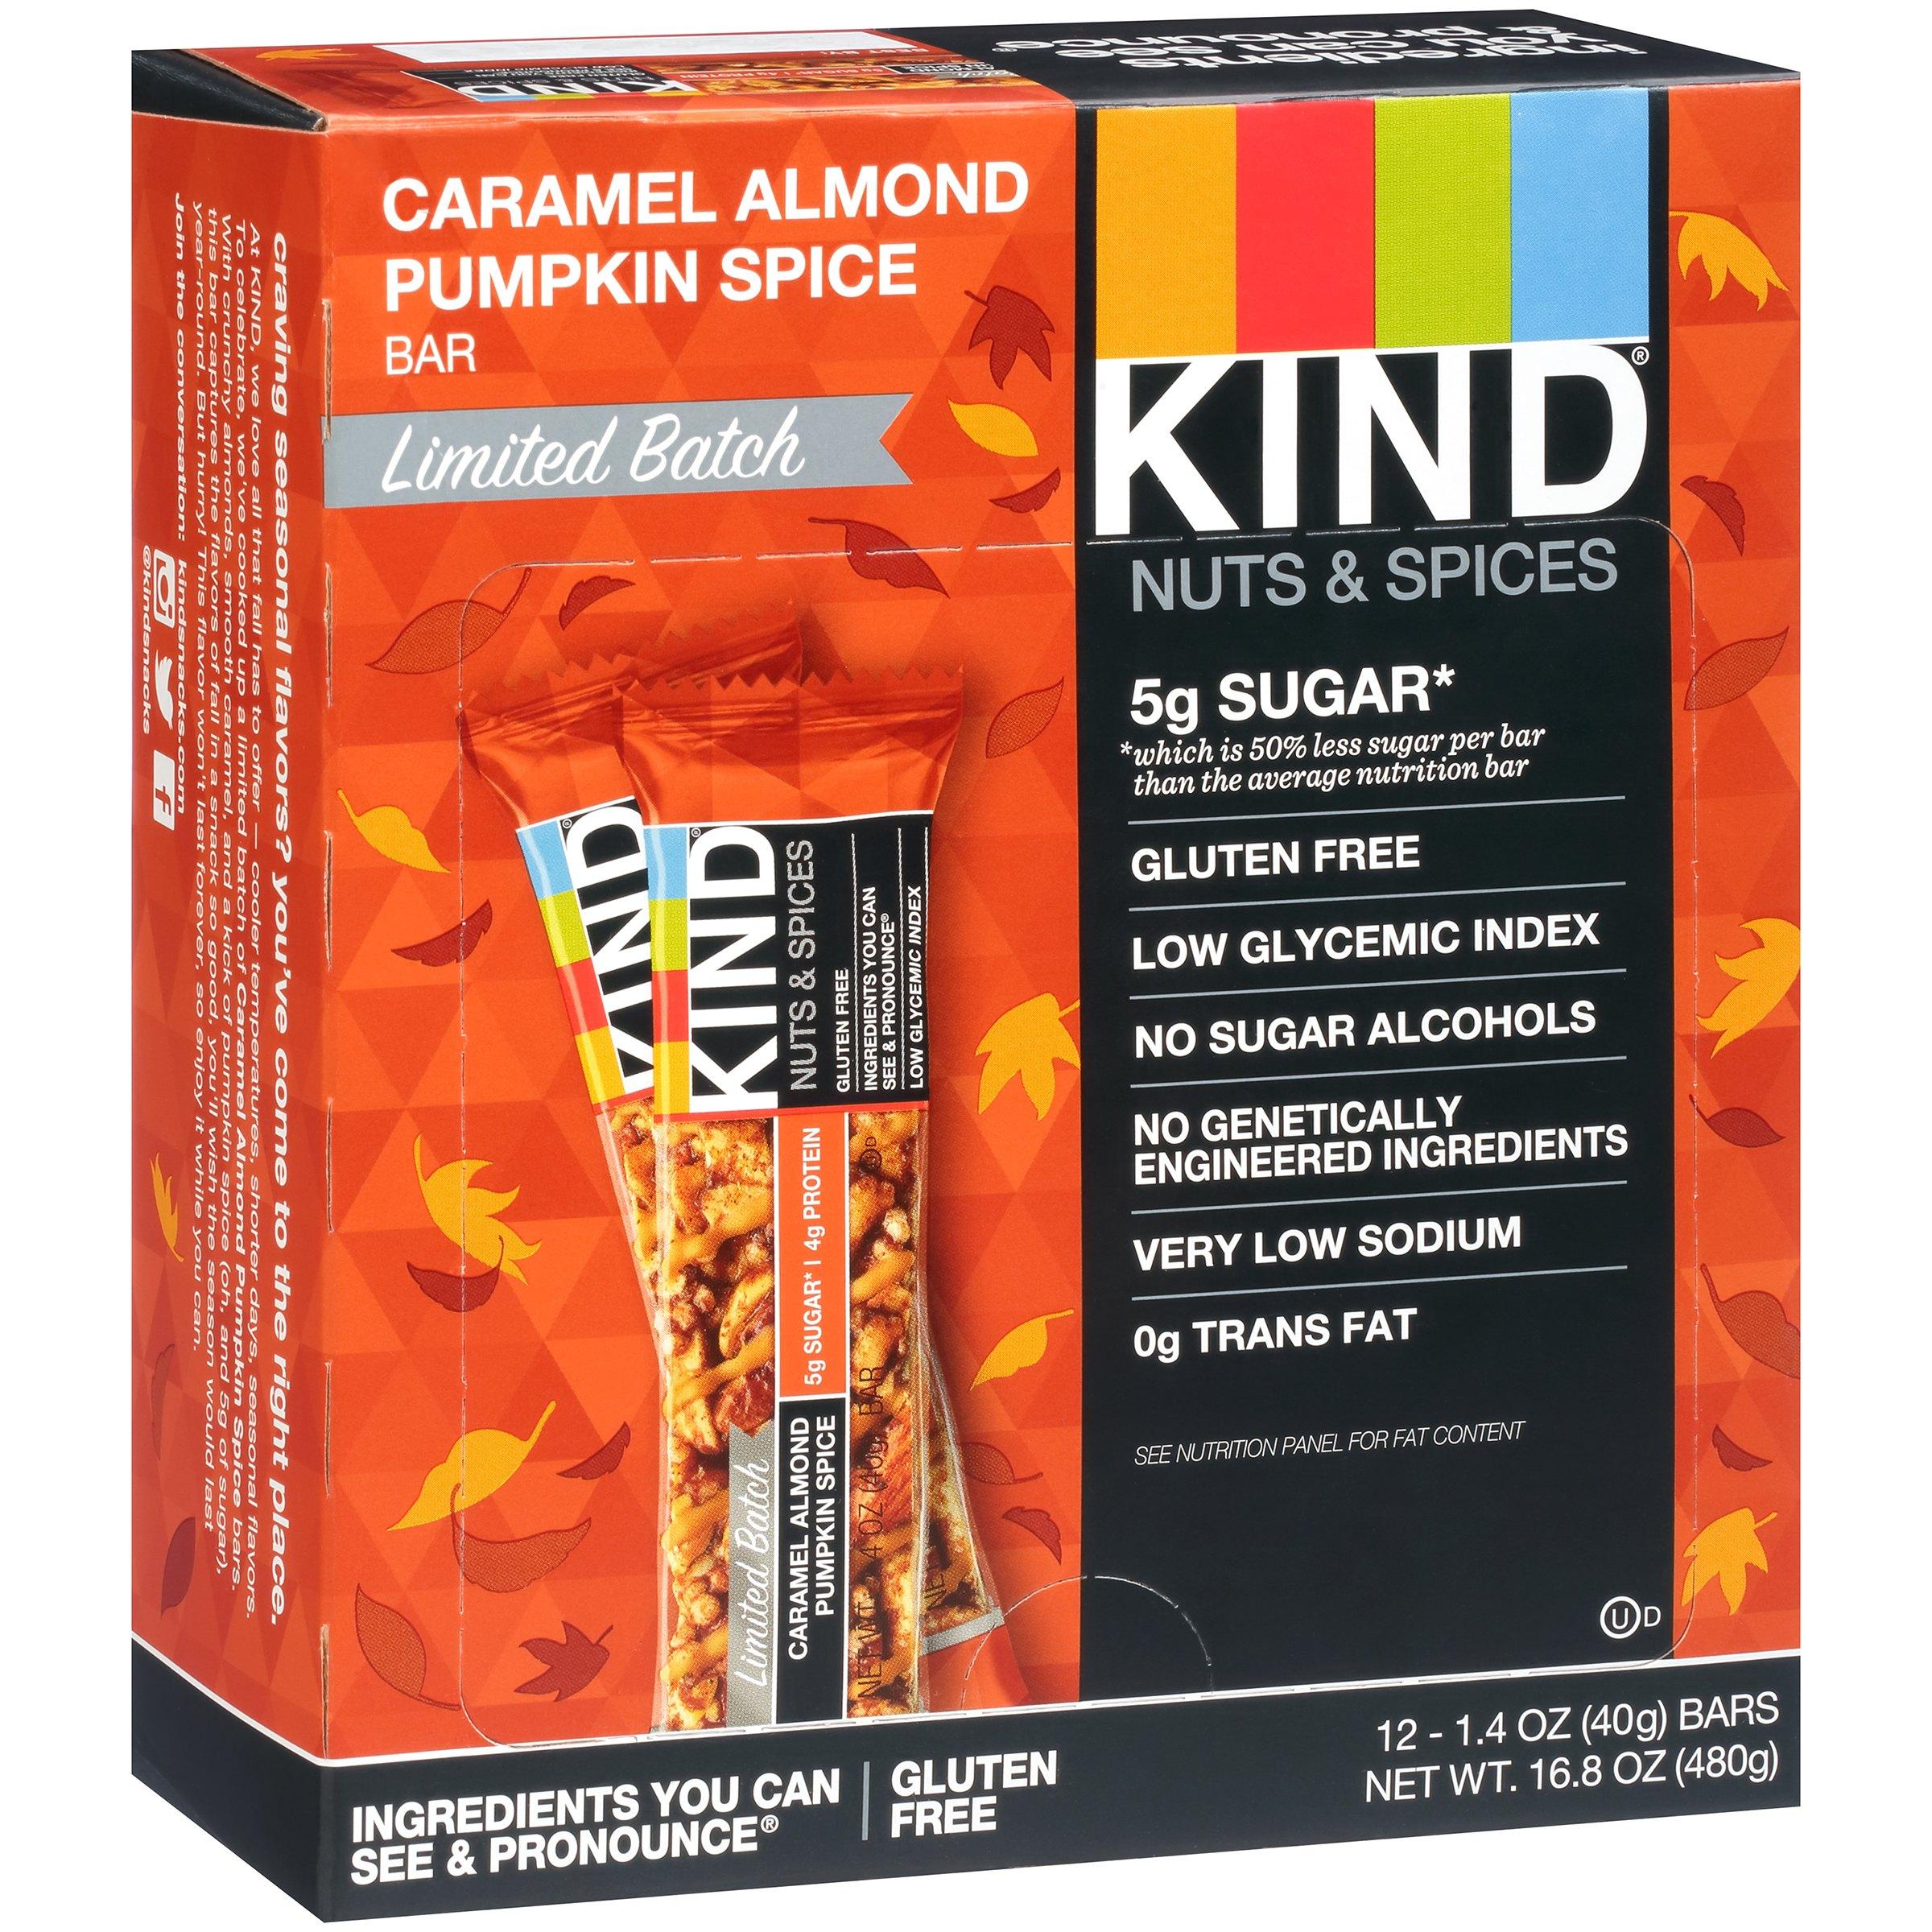 Kind® Nut & Spices Caramel Almond Pumpkin Spice Granola B...